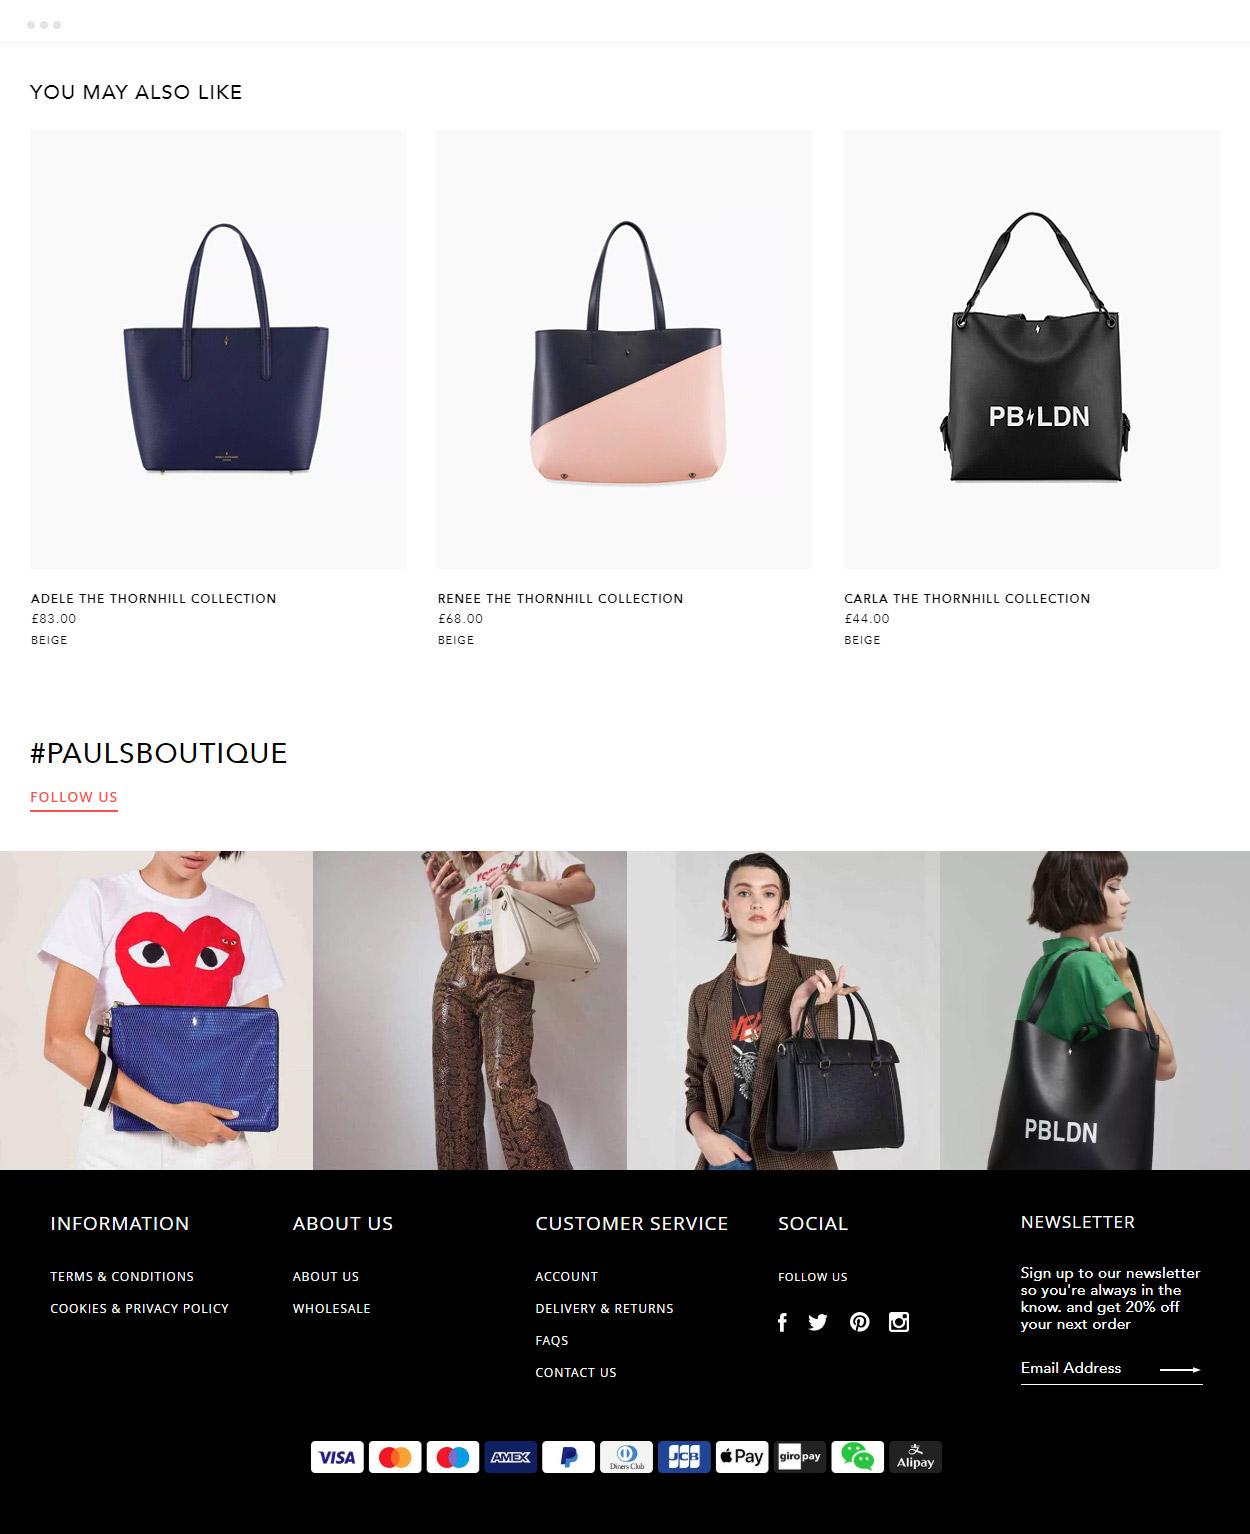 portfolio-detail-paulsboutique-09